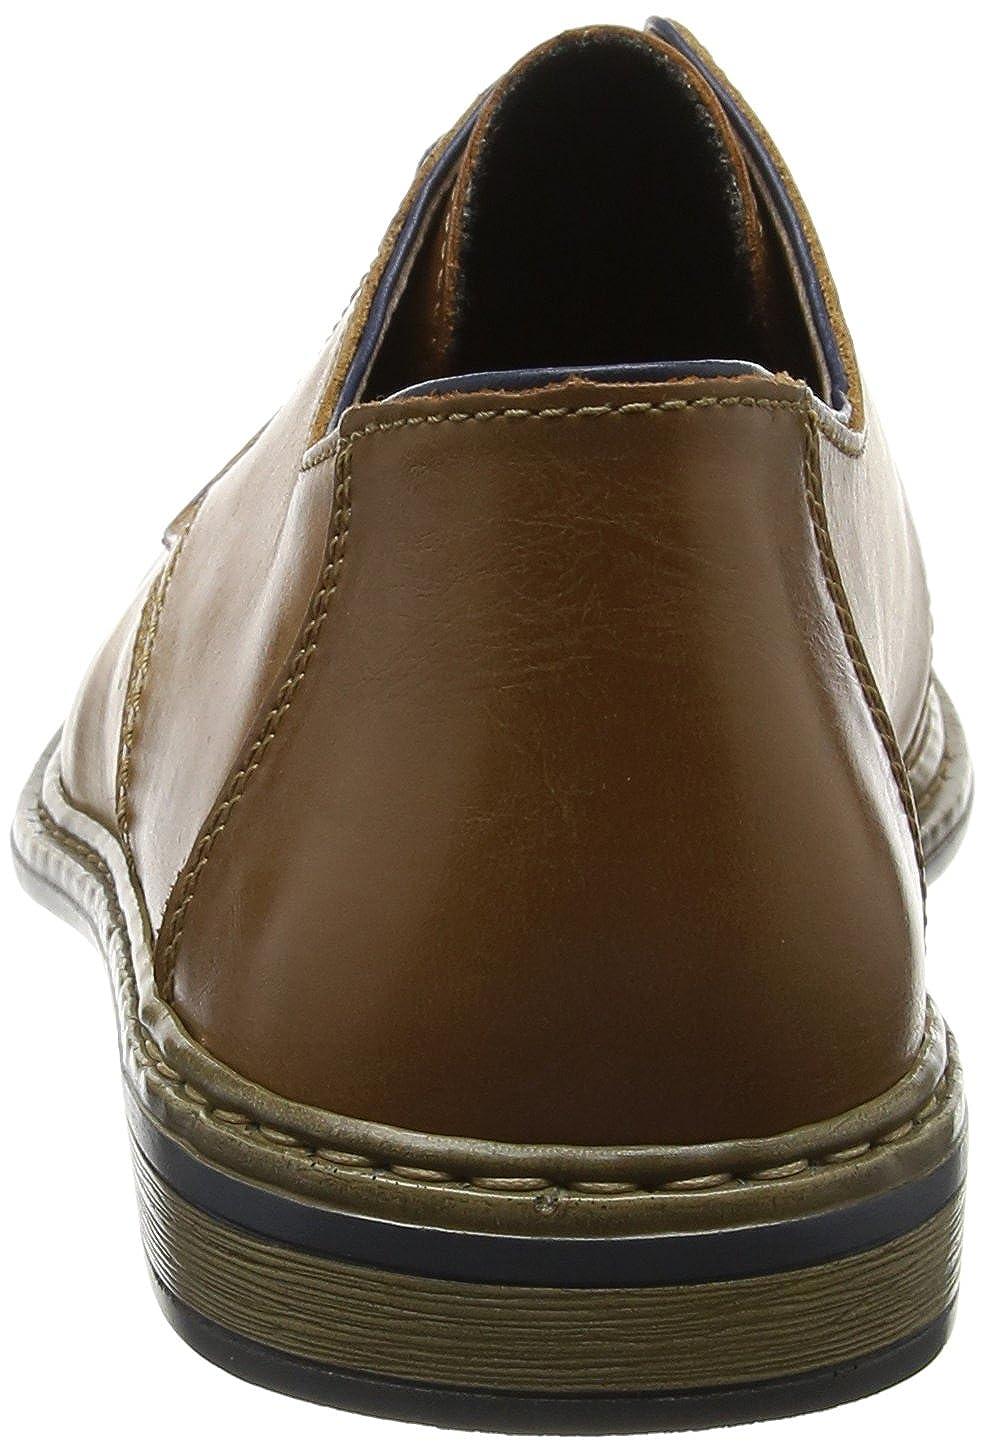 Rieker Mens Zim Lace Up Formal Shoes